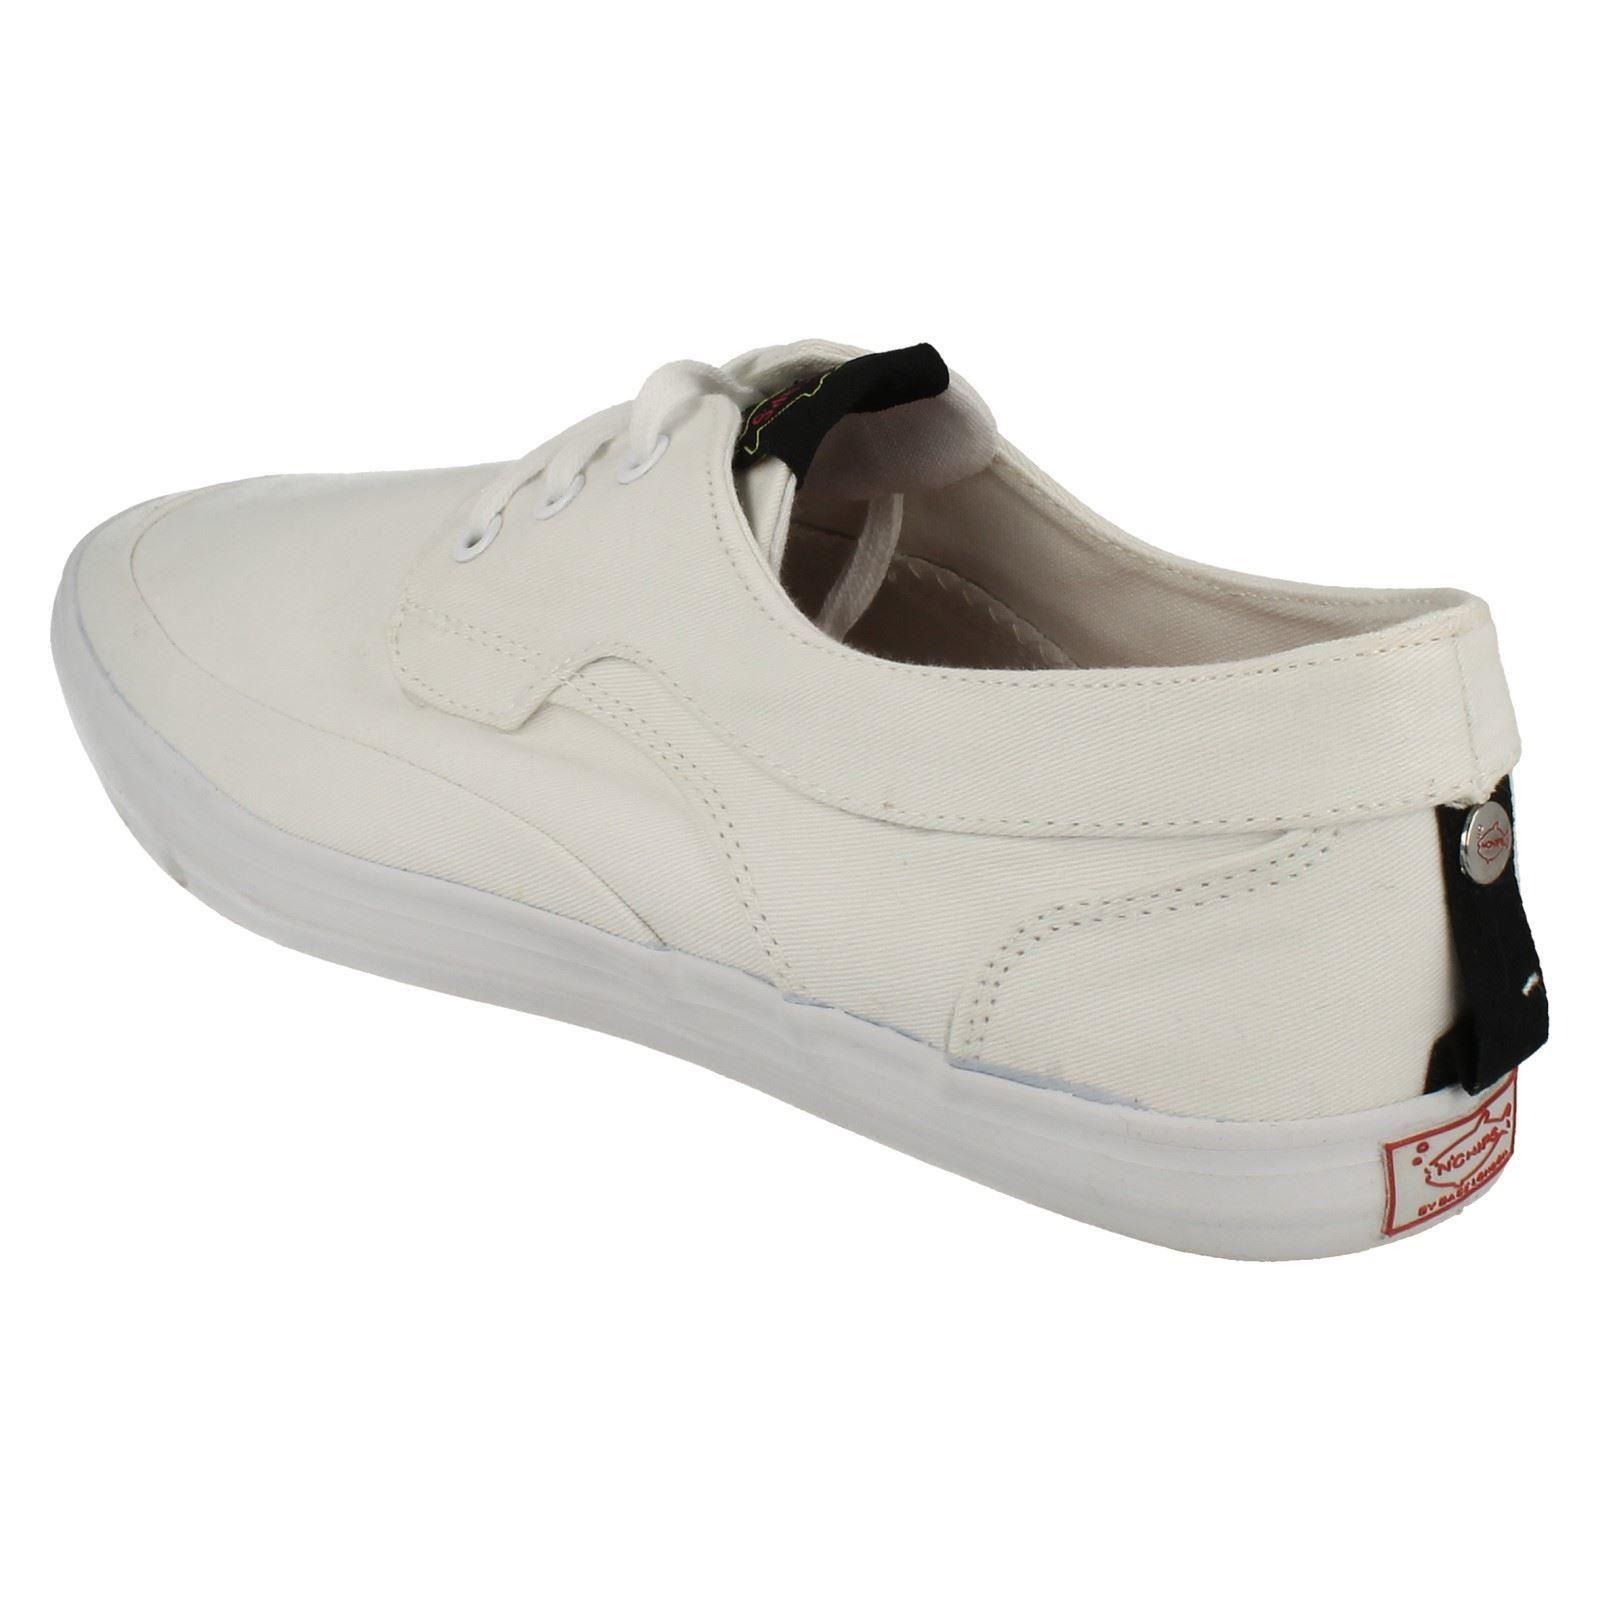 London Casual Chaussures Base Blanc Hommes toile de Tartare O1w7xWx5qv